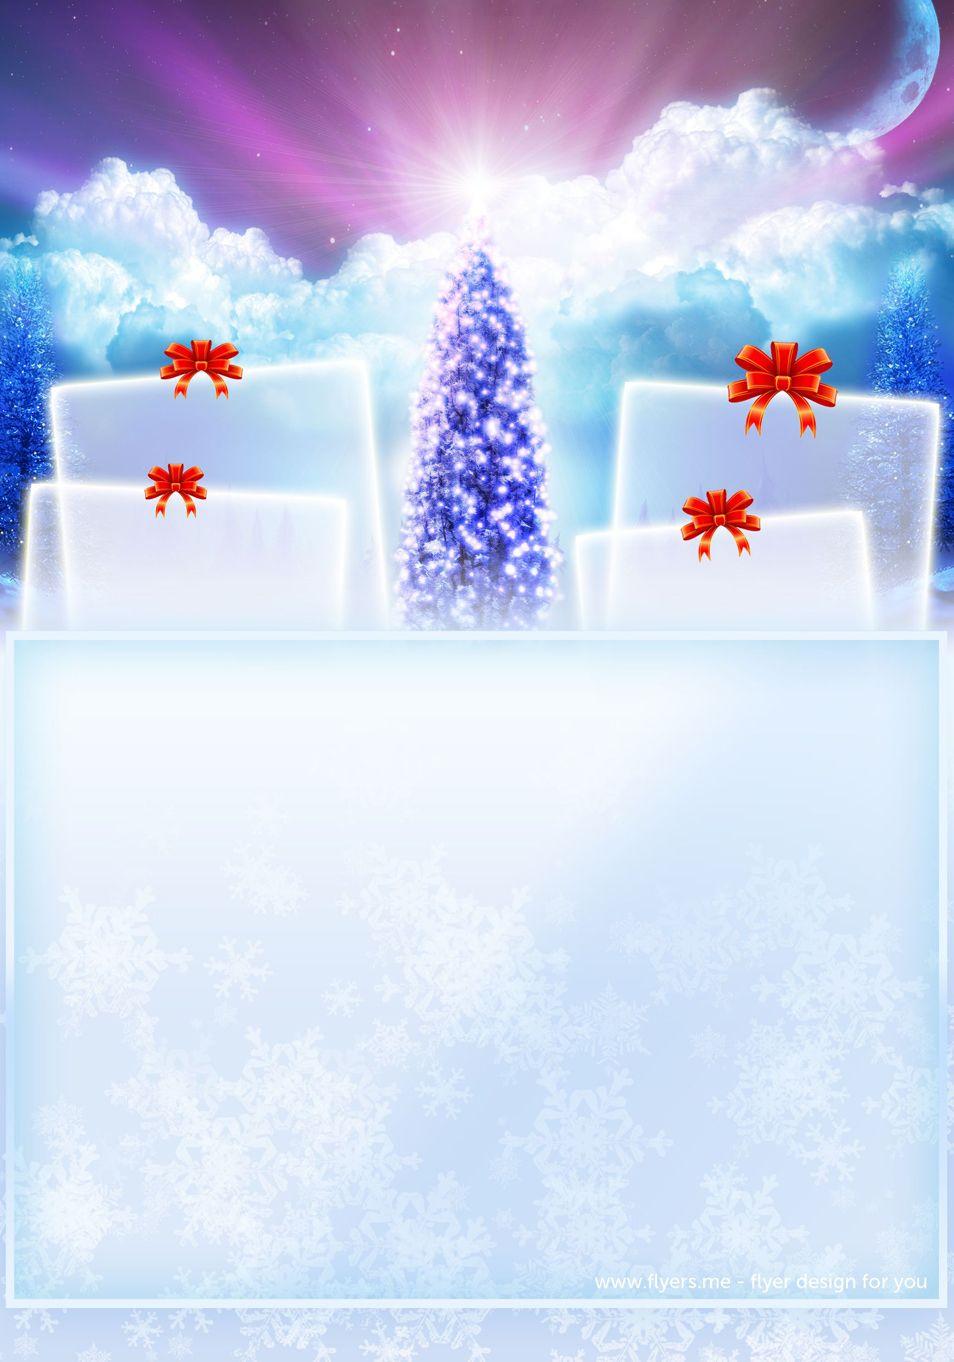 Christmas Invitation Card With Psd Christmas Card Templates Free Free Christmas Greeting Cards Christmas Cards Free